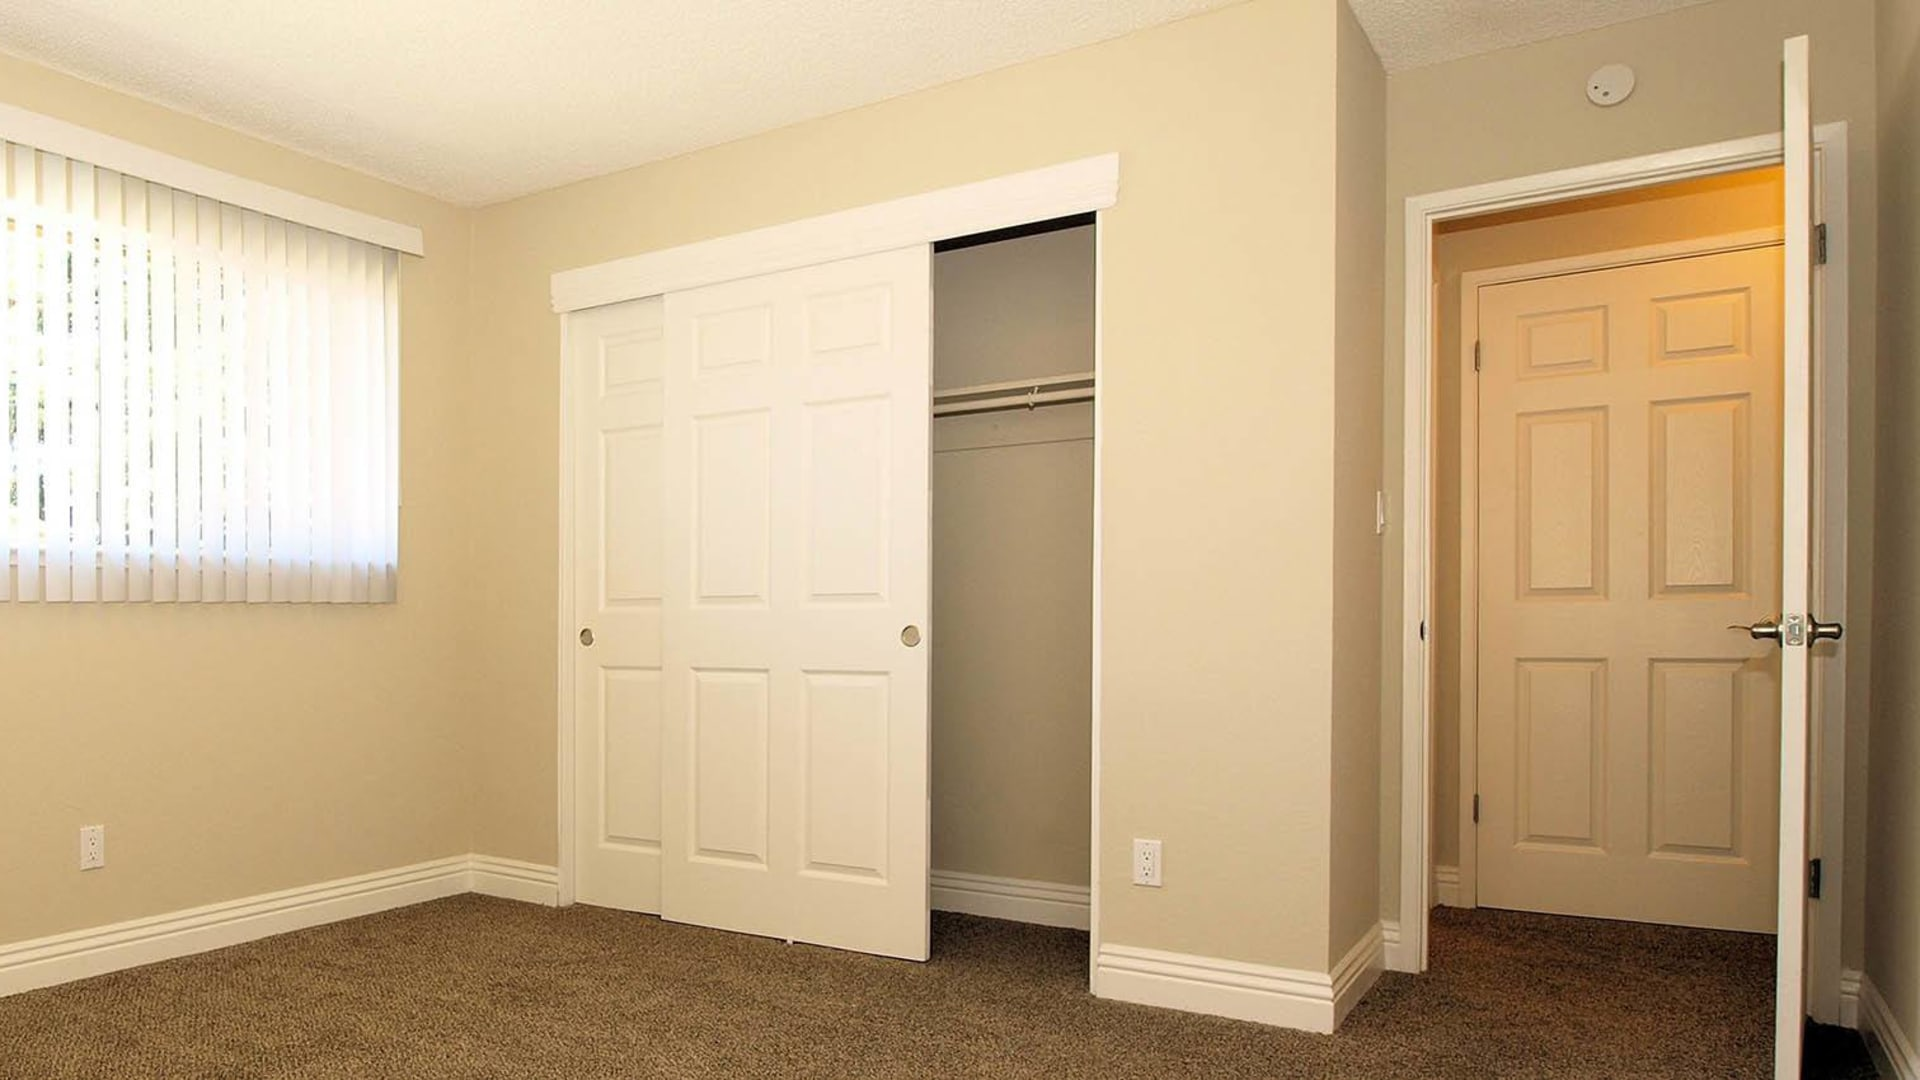 Bedroom at Spring Lake Apartment Homes in Santa Rosa, California